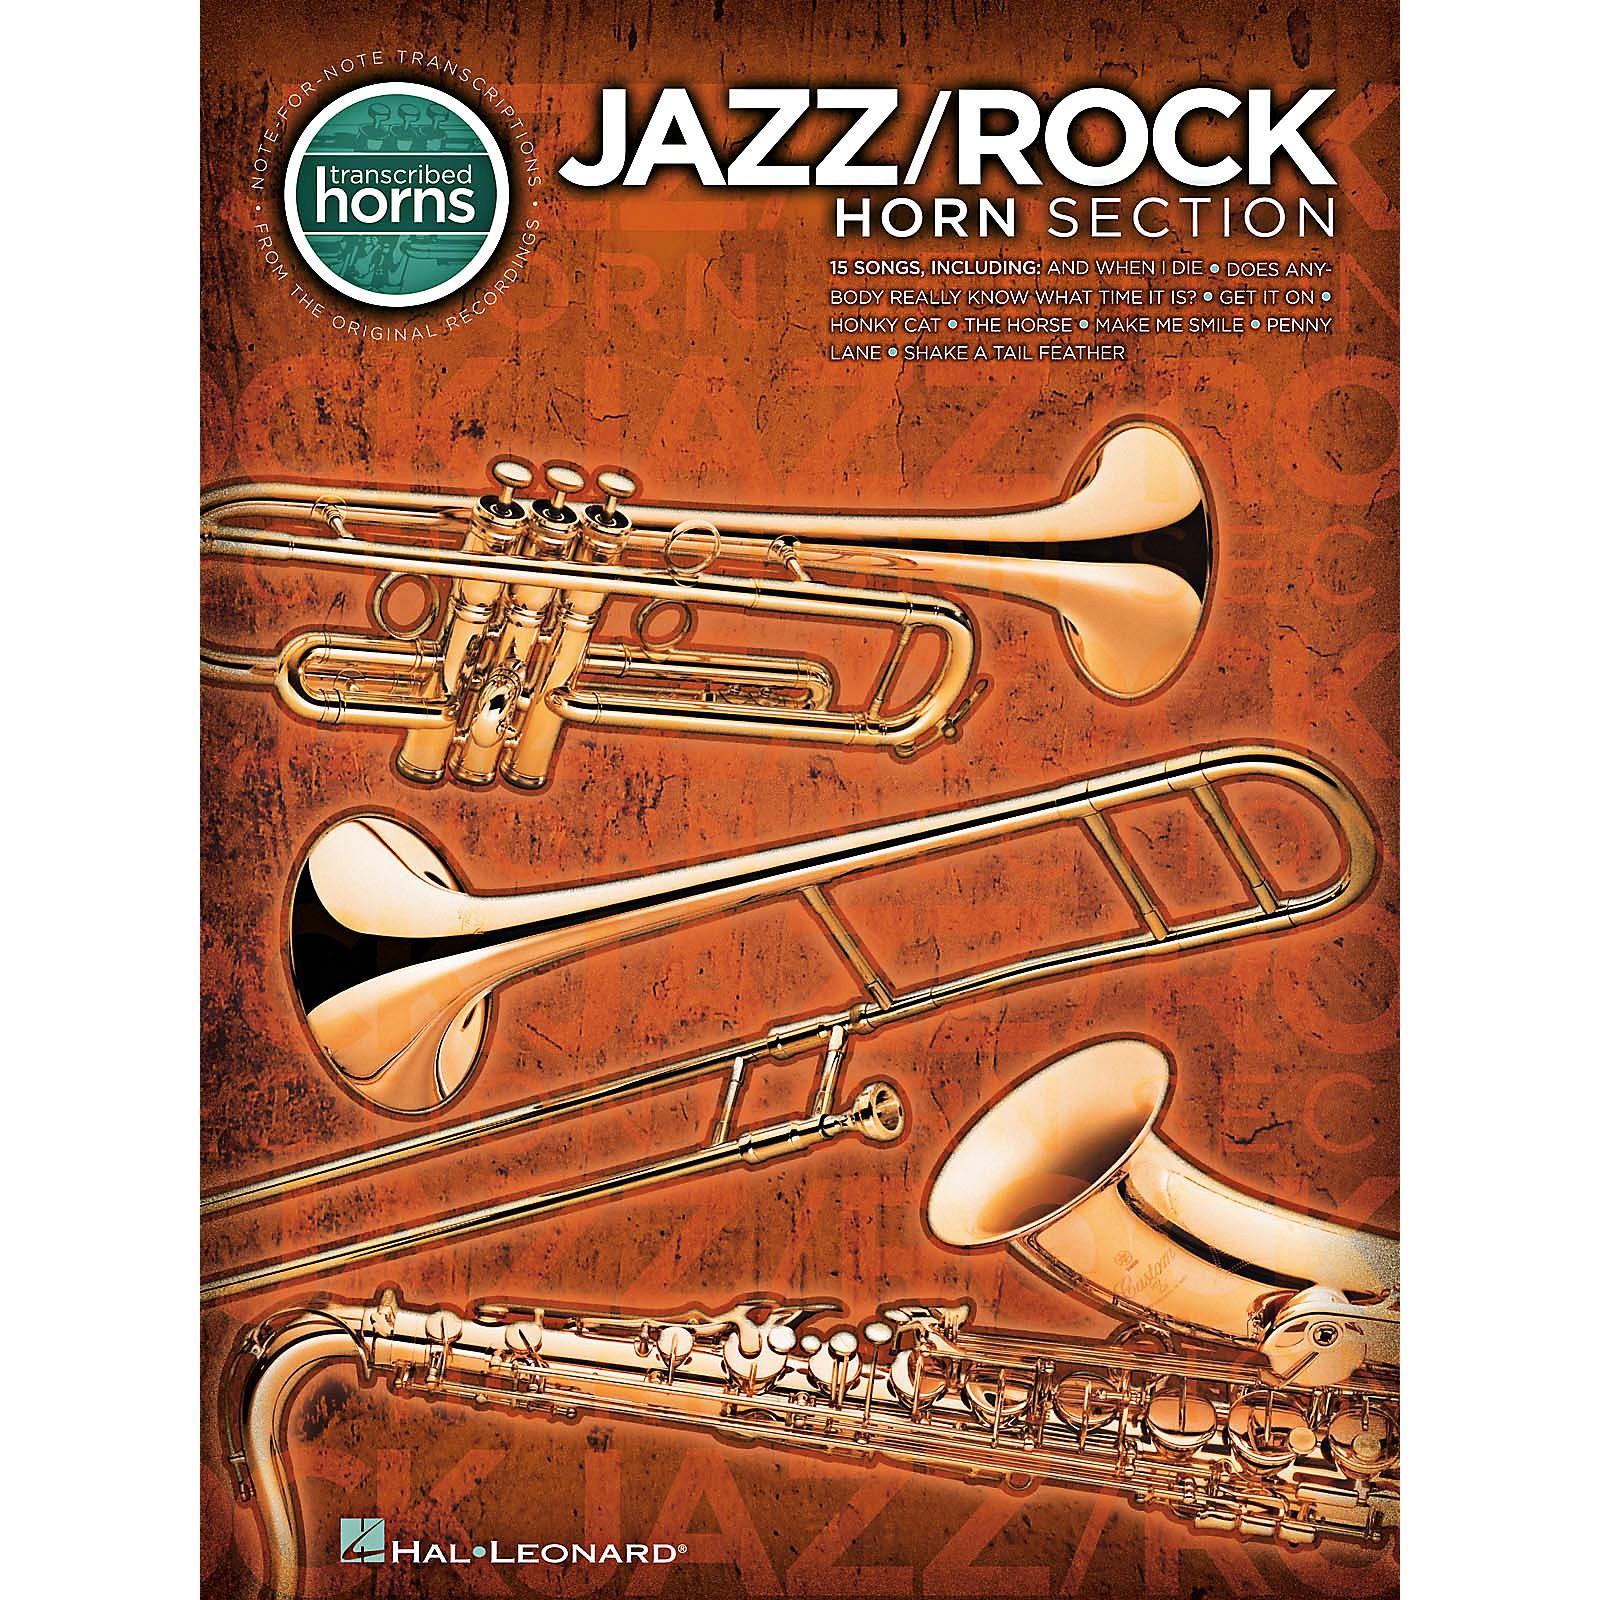 Hal Leonard Jazz/Rock Horn Section - Transcribed Horn Songbook